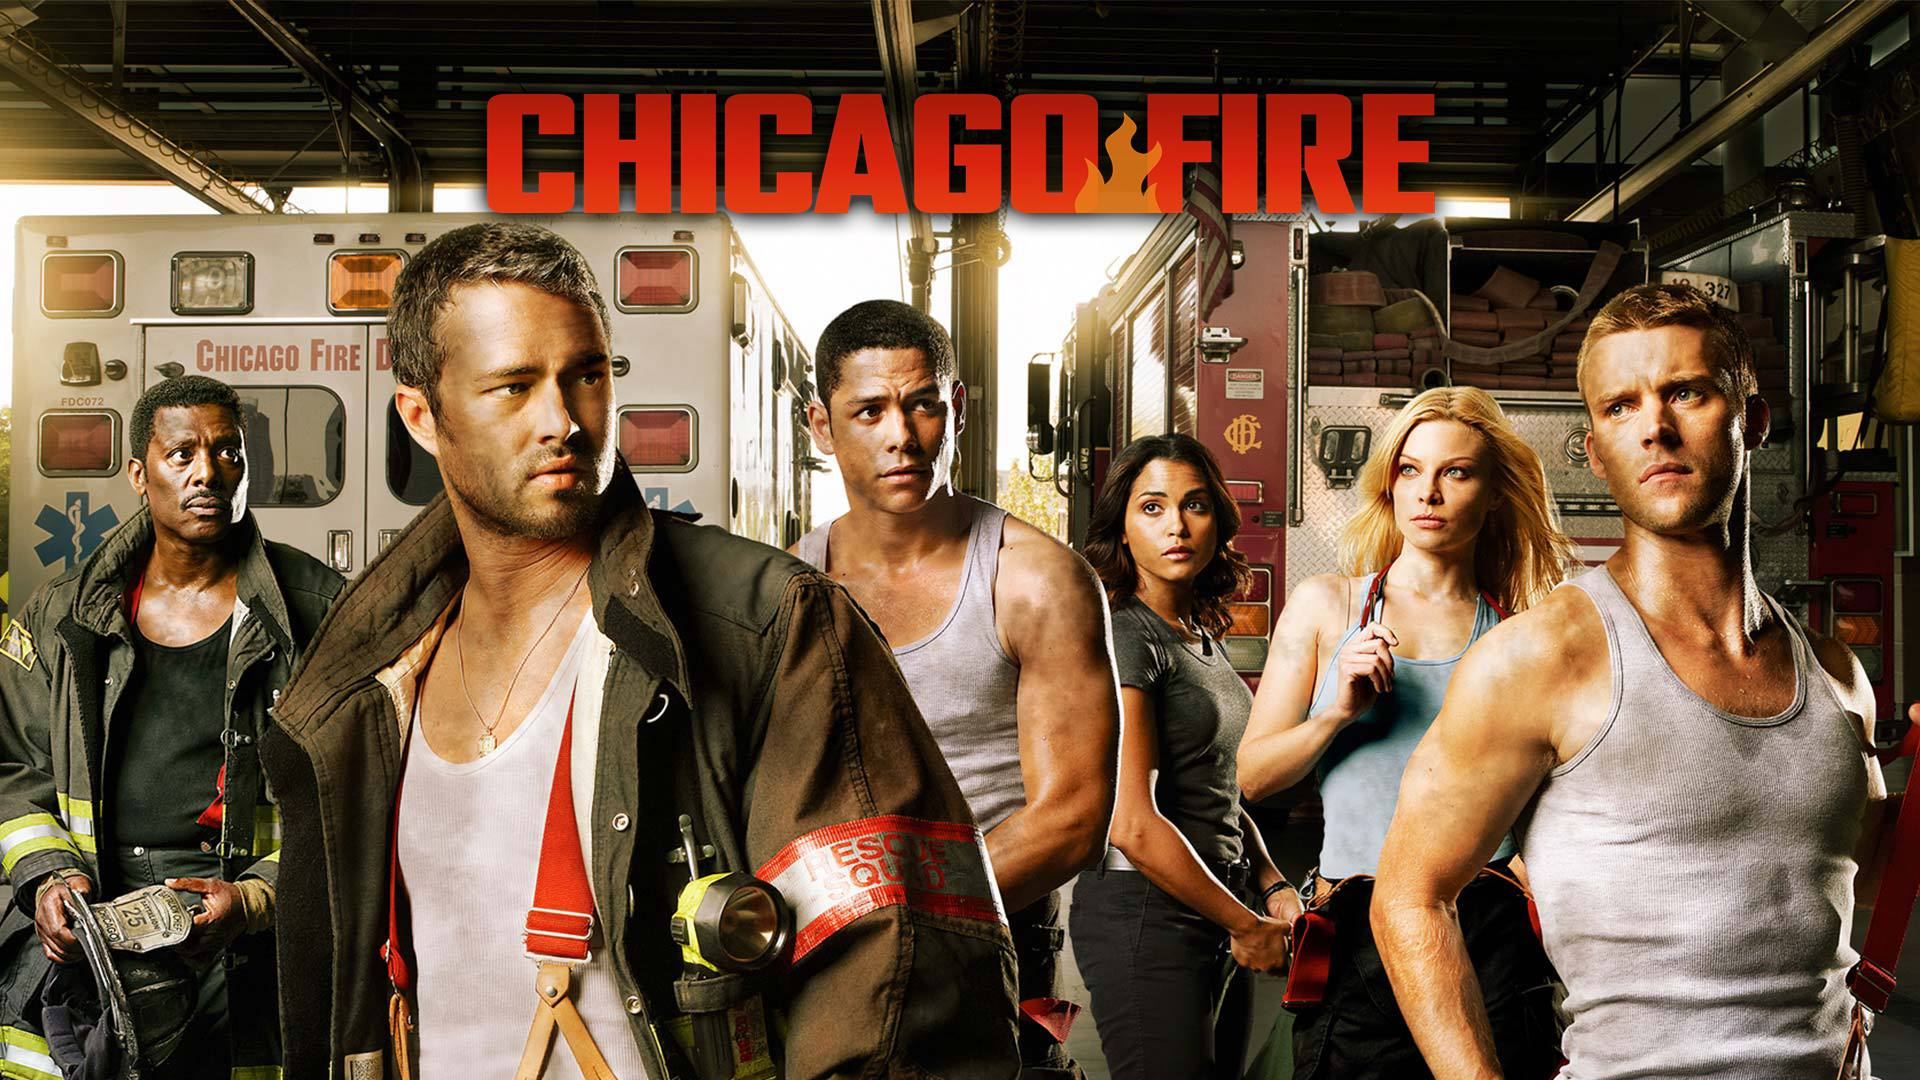 Chicago Fire Season 1